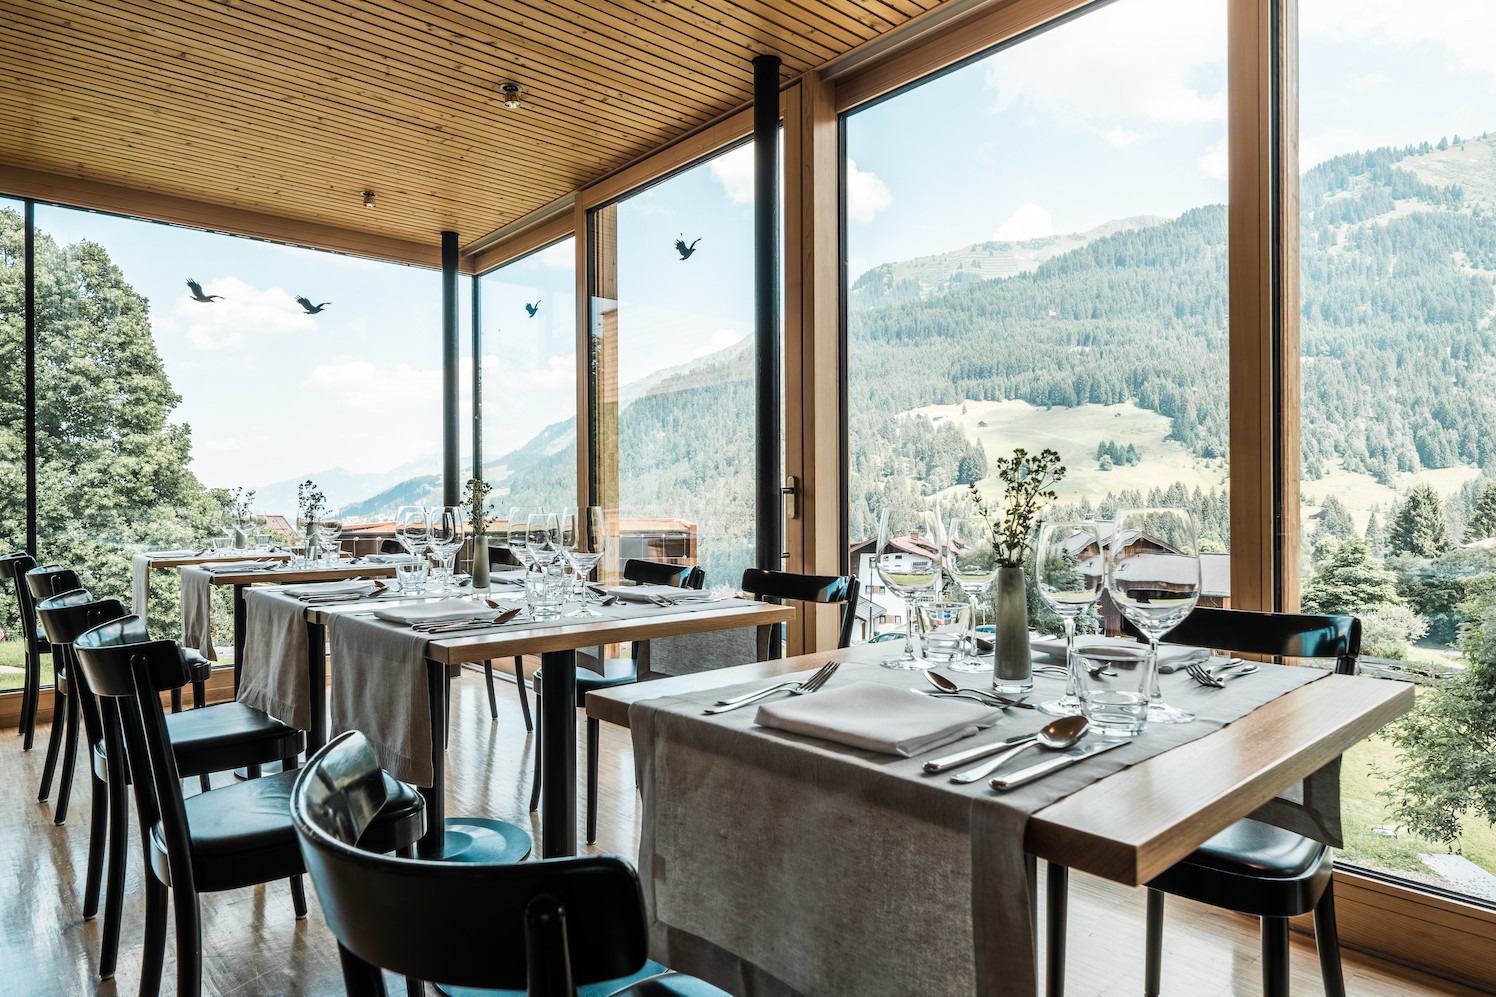 Restaurant Kesslers Walsereck Naturhotel